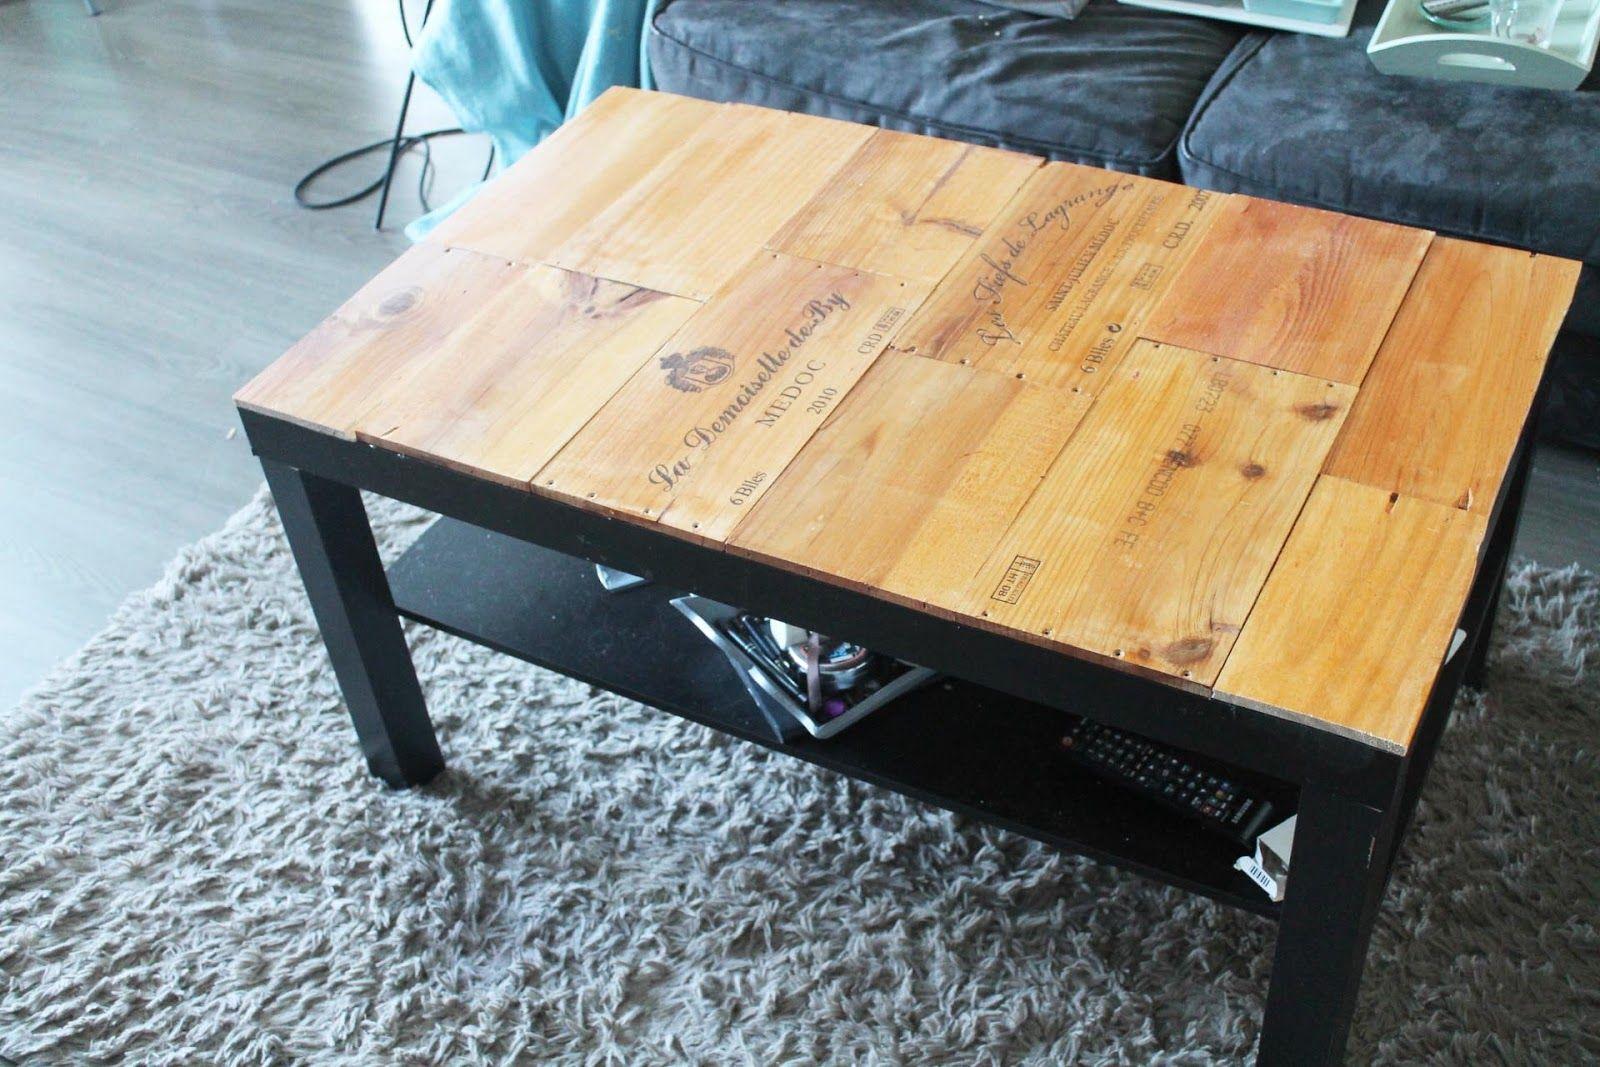 Table Basse Avec Caisse A Vin customise ta table basse avec des caisses de vin